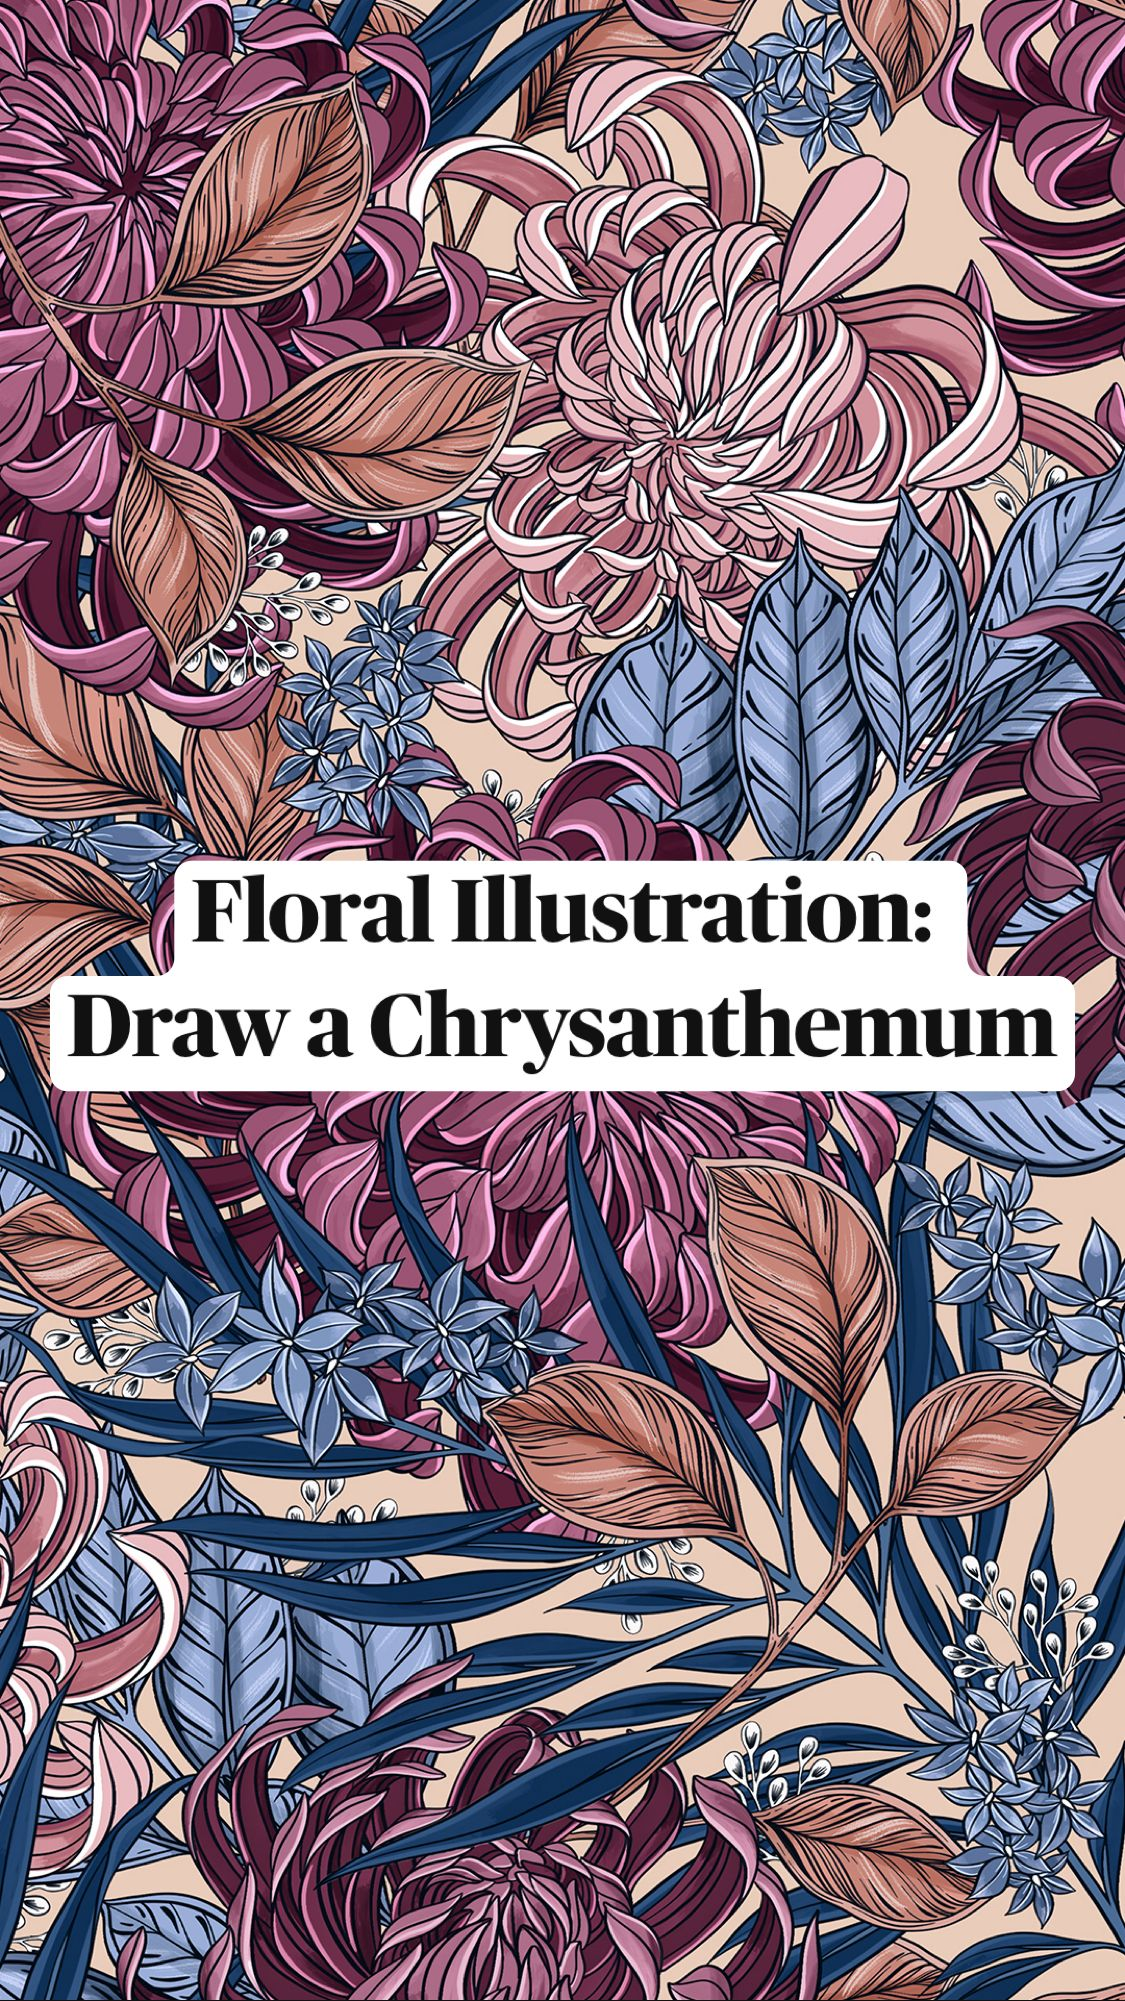 Floral Illustration:  Draw a Chrysanthemum